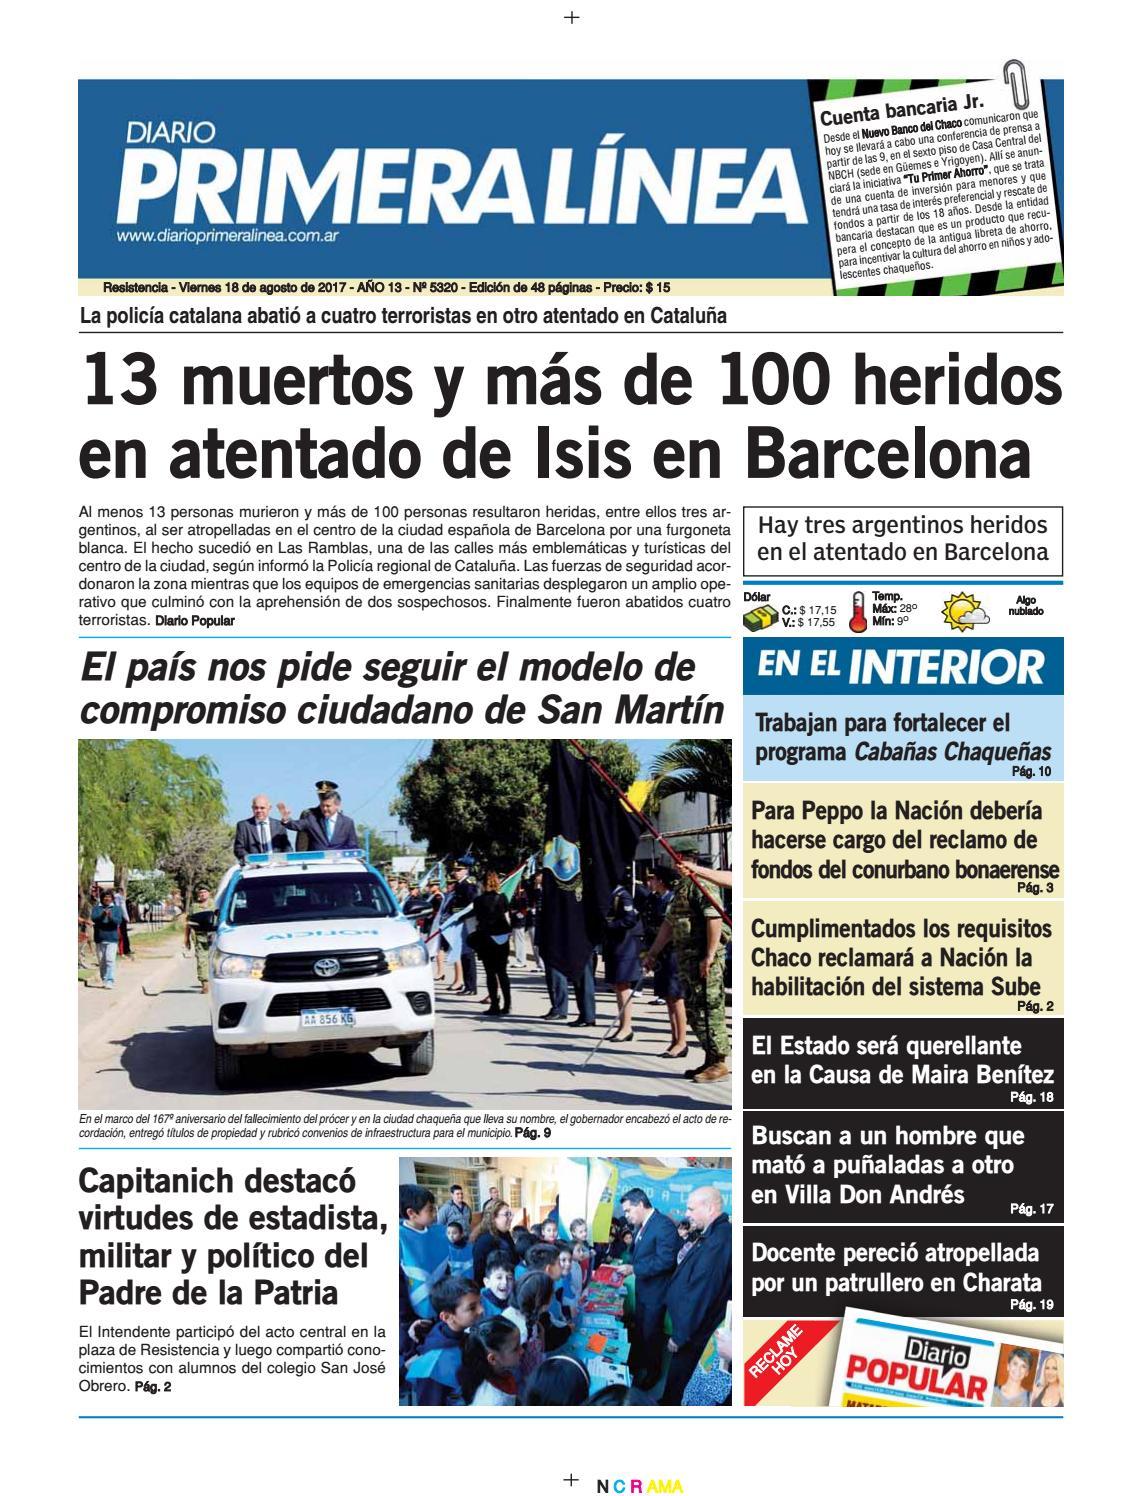 Linea 18 08 Diario Línea Issuu 5320 17 Primera By 29WHDEI